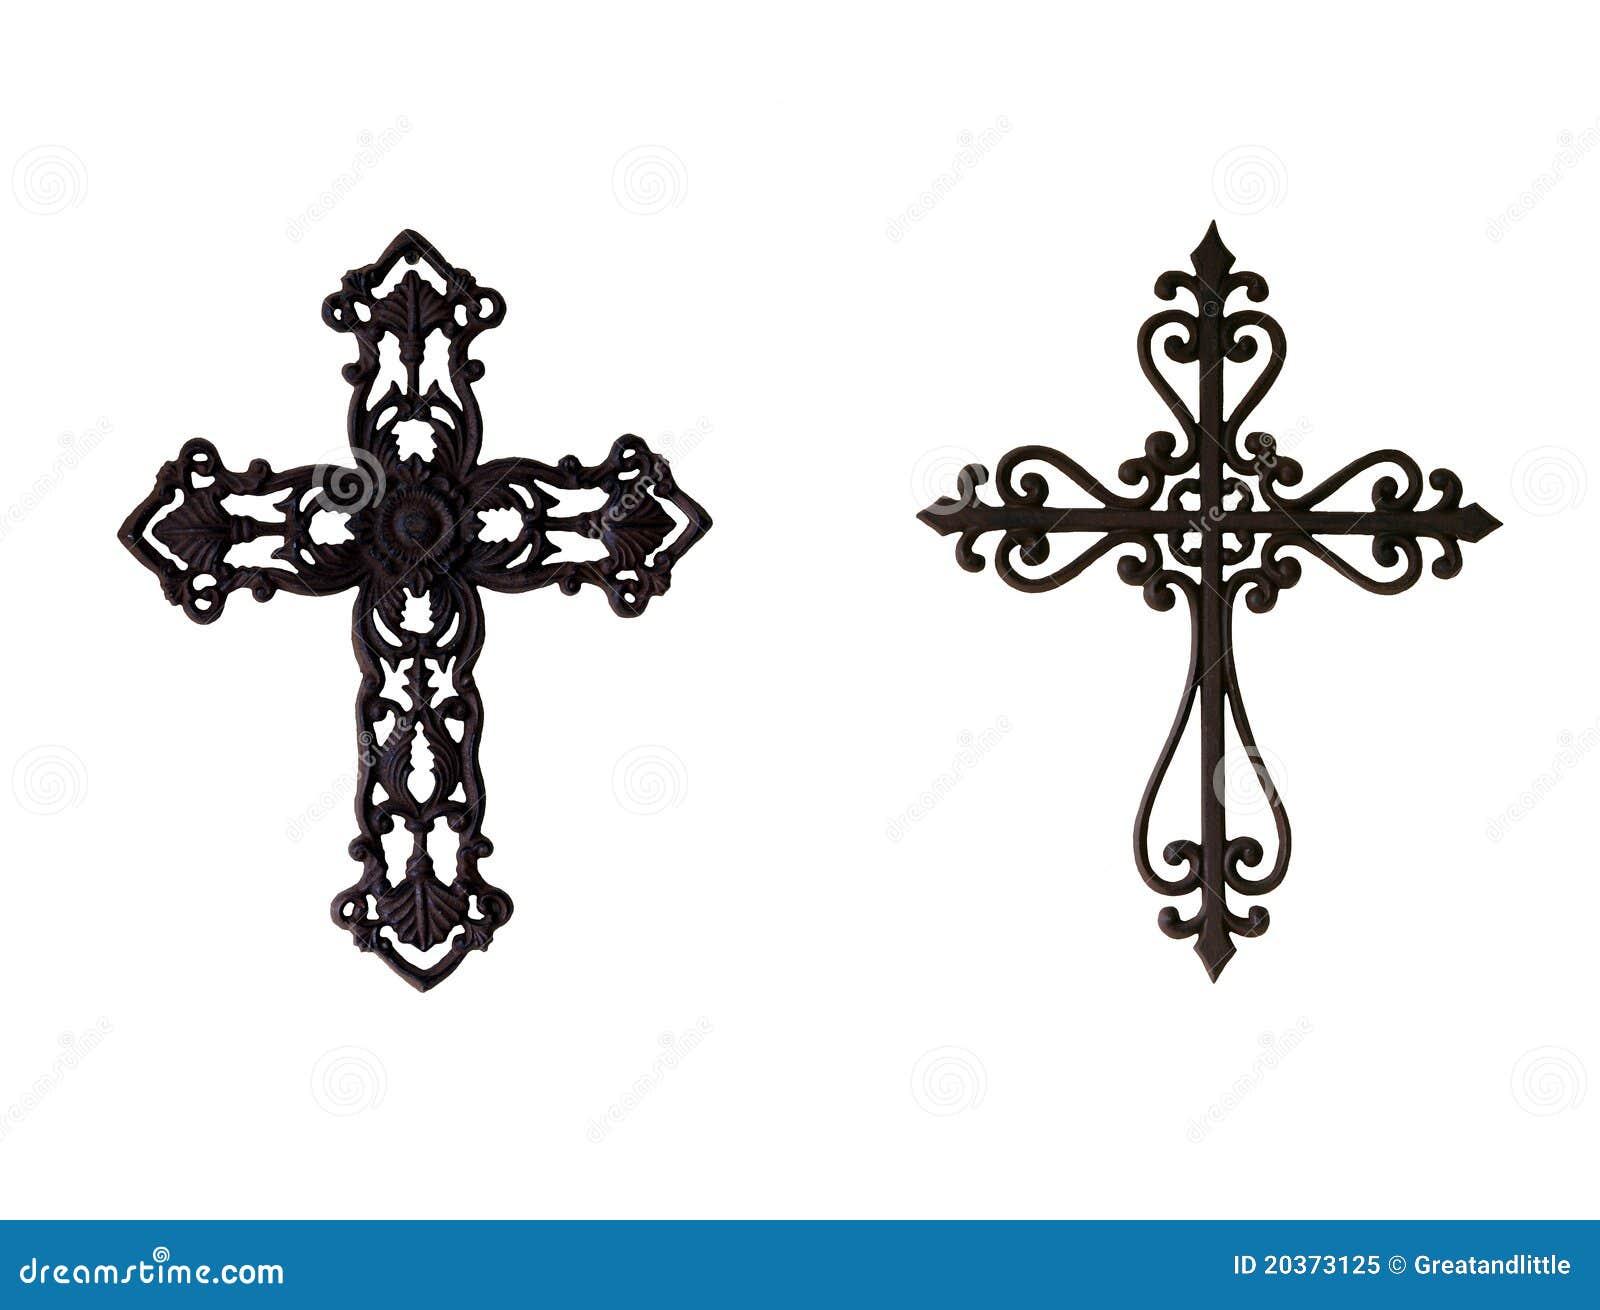 Two Iron Crosses Royalty Free Stock Photo Image 20373125